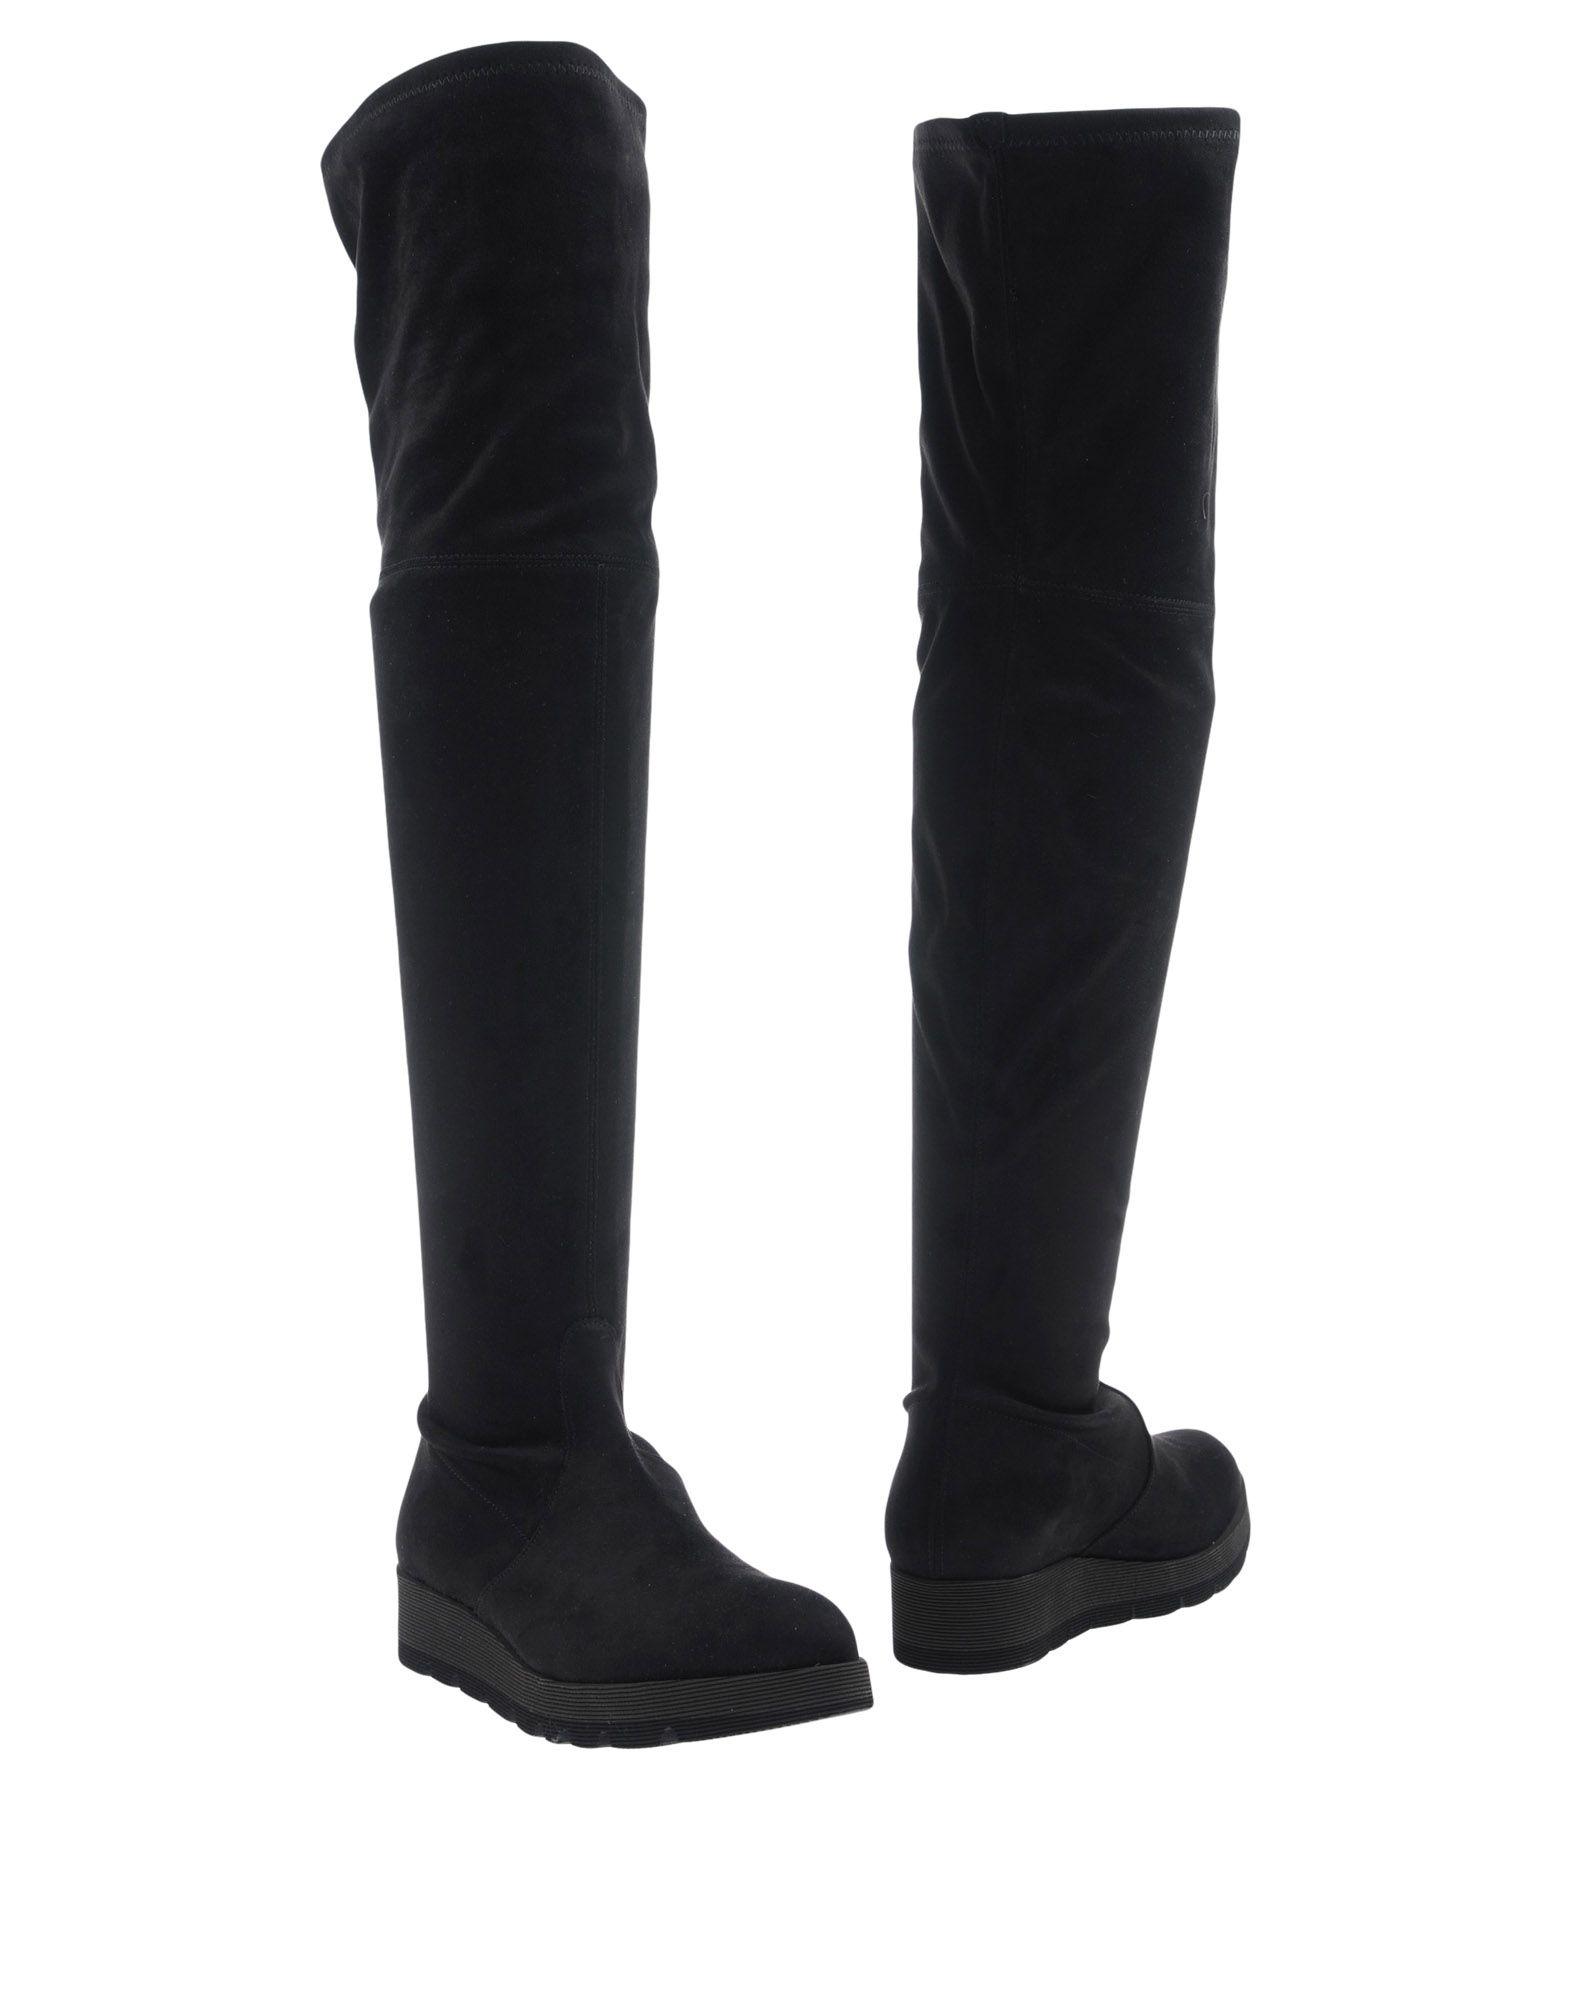 fe4feac278e Pons Quintana Boots In Black